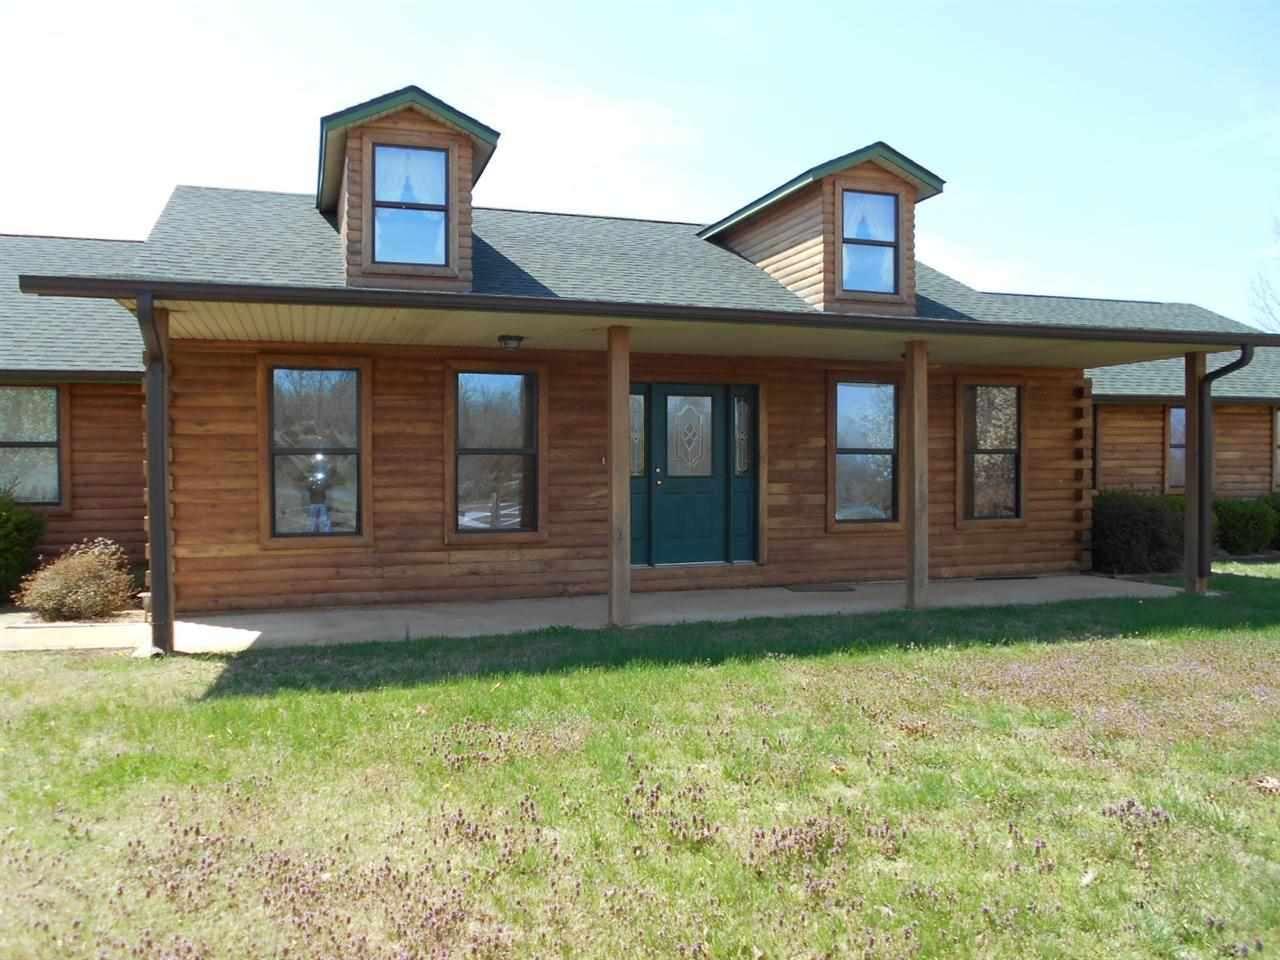 Real Estate for Sale, ListingId: 33416026, Doniphan,MO63935